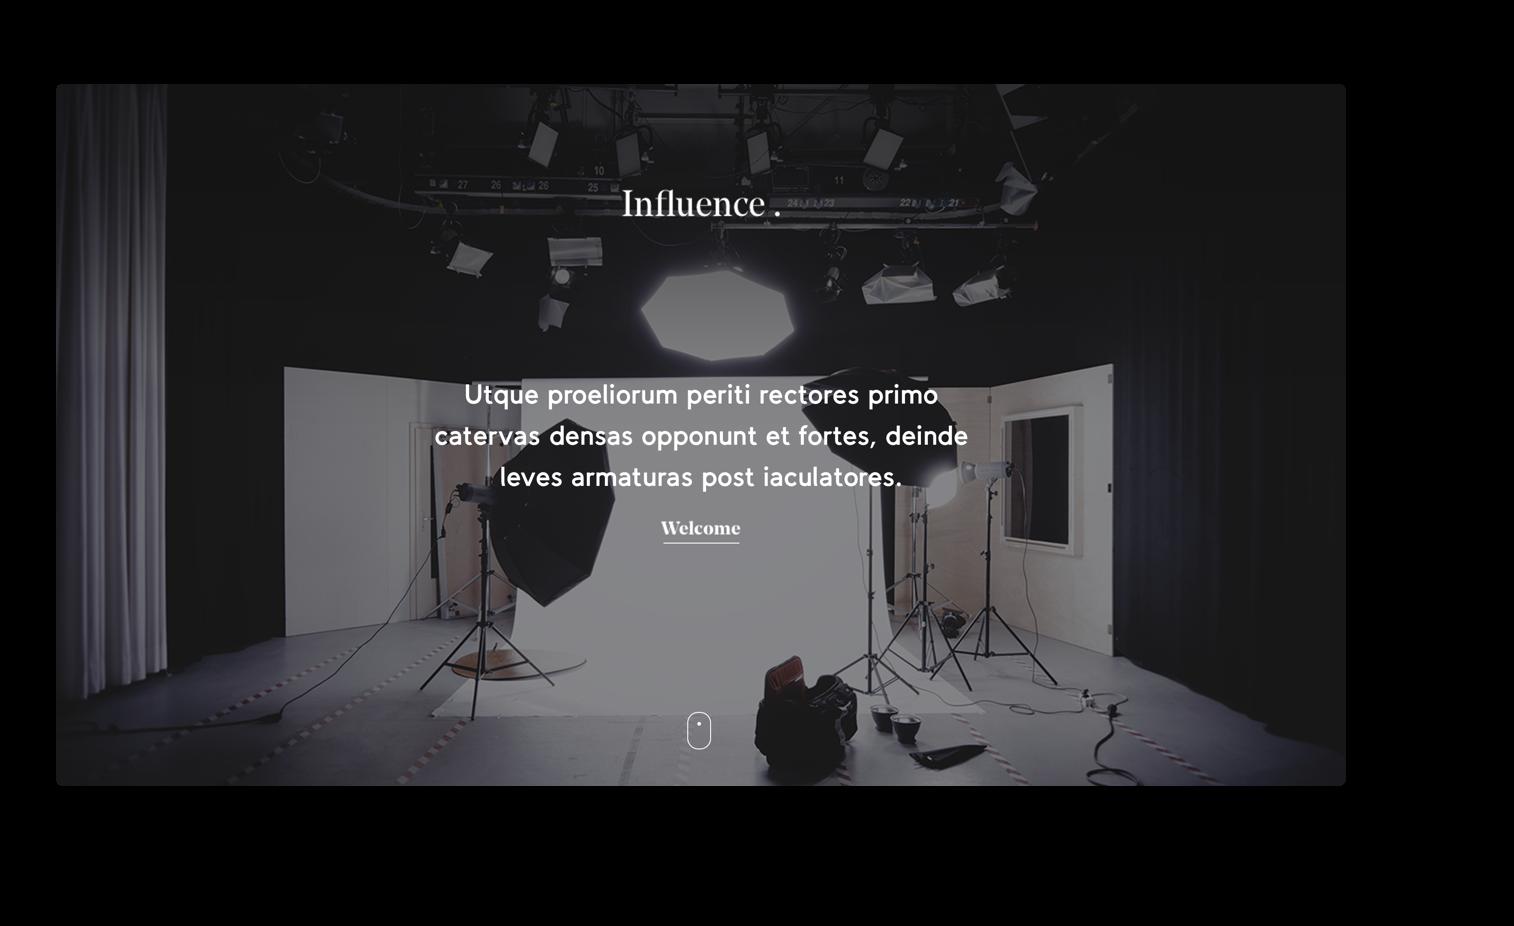 projet_influence-robin_p-designer_01@2x